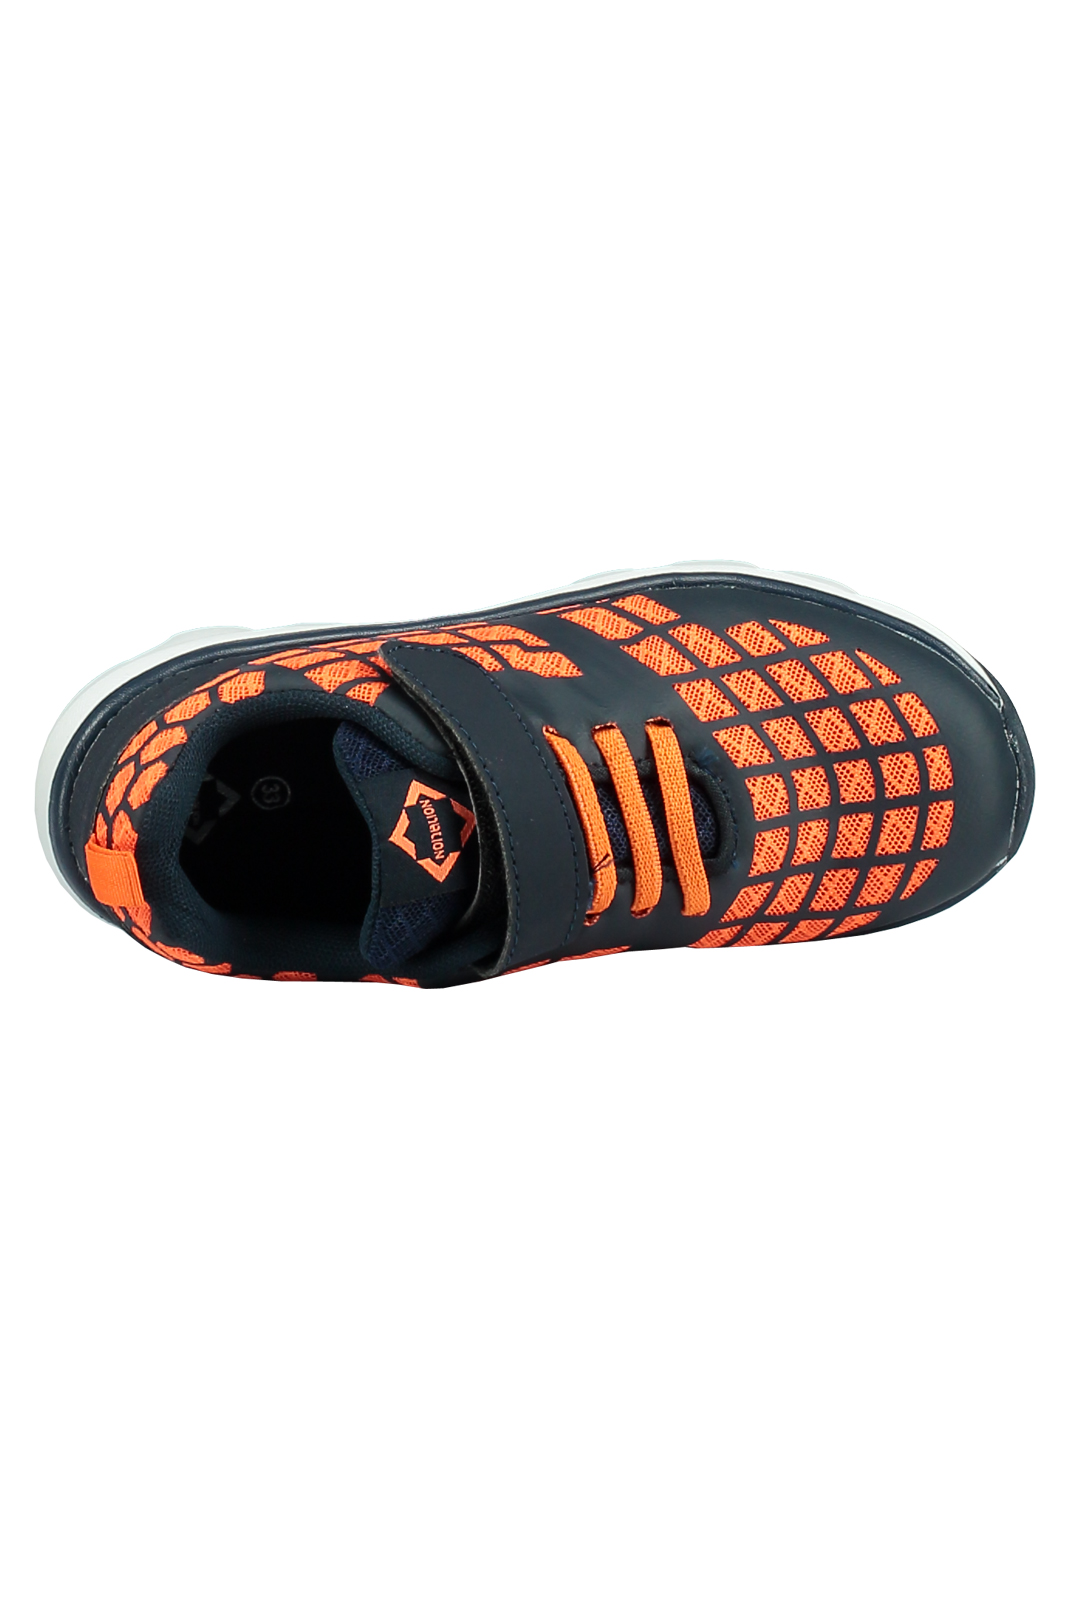 cheaper 696db 7194a Gamla NationNn Jr Shoes Kille Sport Molveno Skor Artgruppe No w8PkNZn0OX